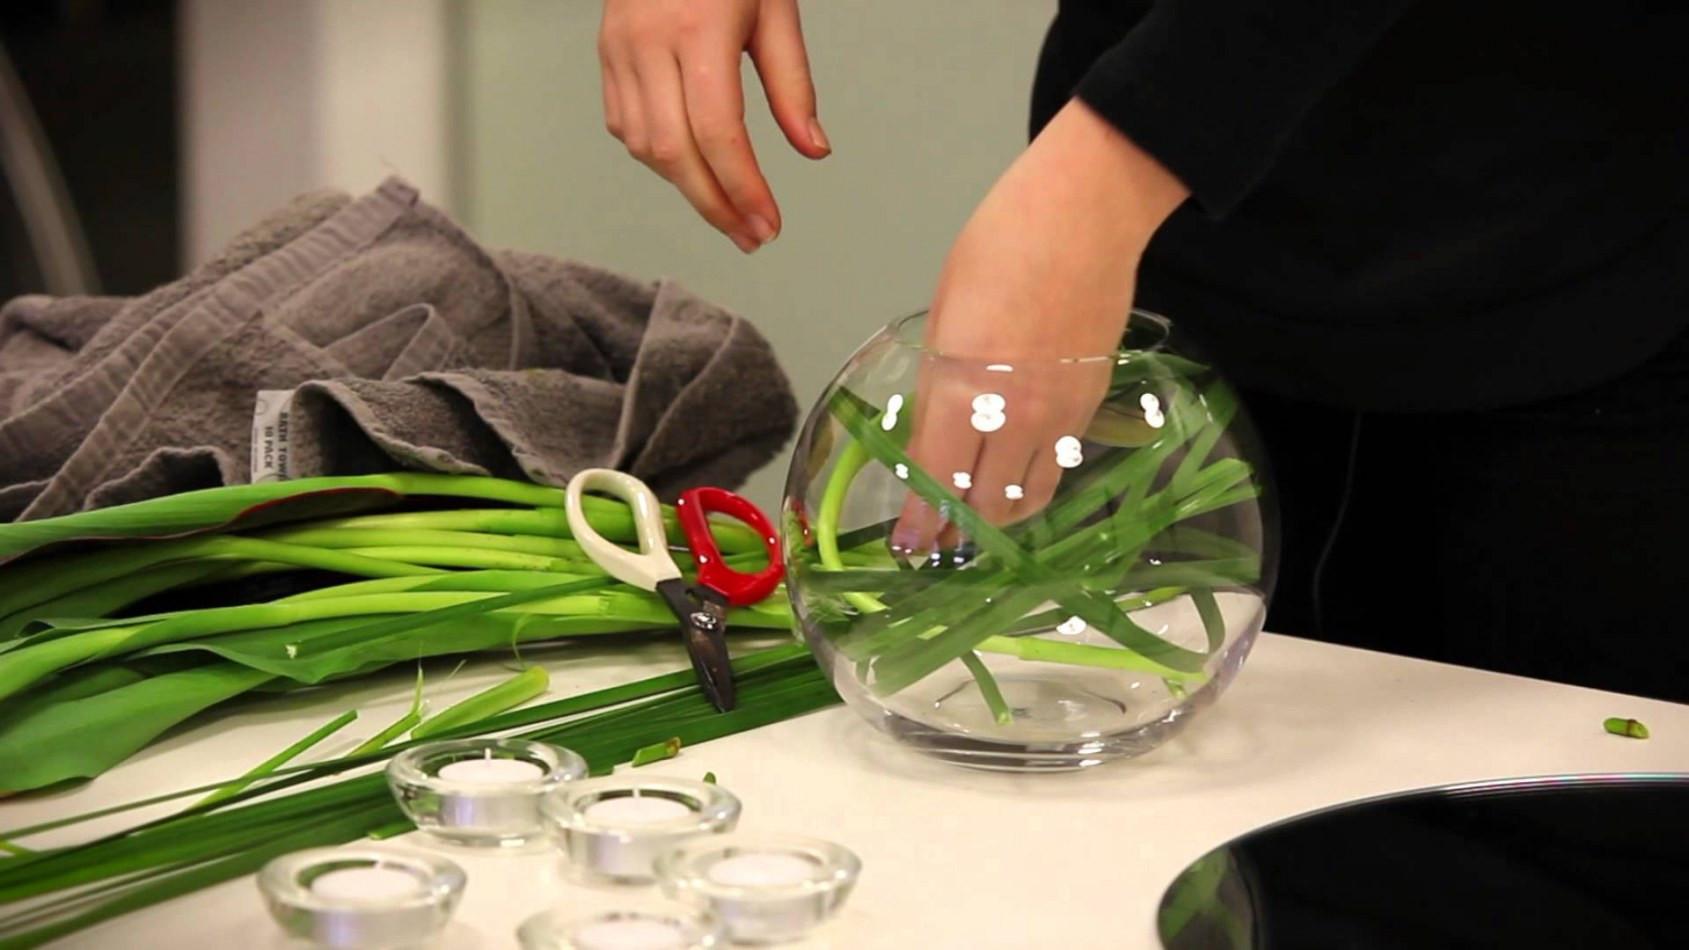 fish design vase of gl fish bowl flower arrangements flowers healthy regarding astounding wedding centerpieces using fish bowls contemporary best gl bowl centerpieces for weddings best wedding leimage co